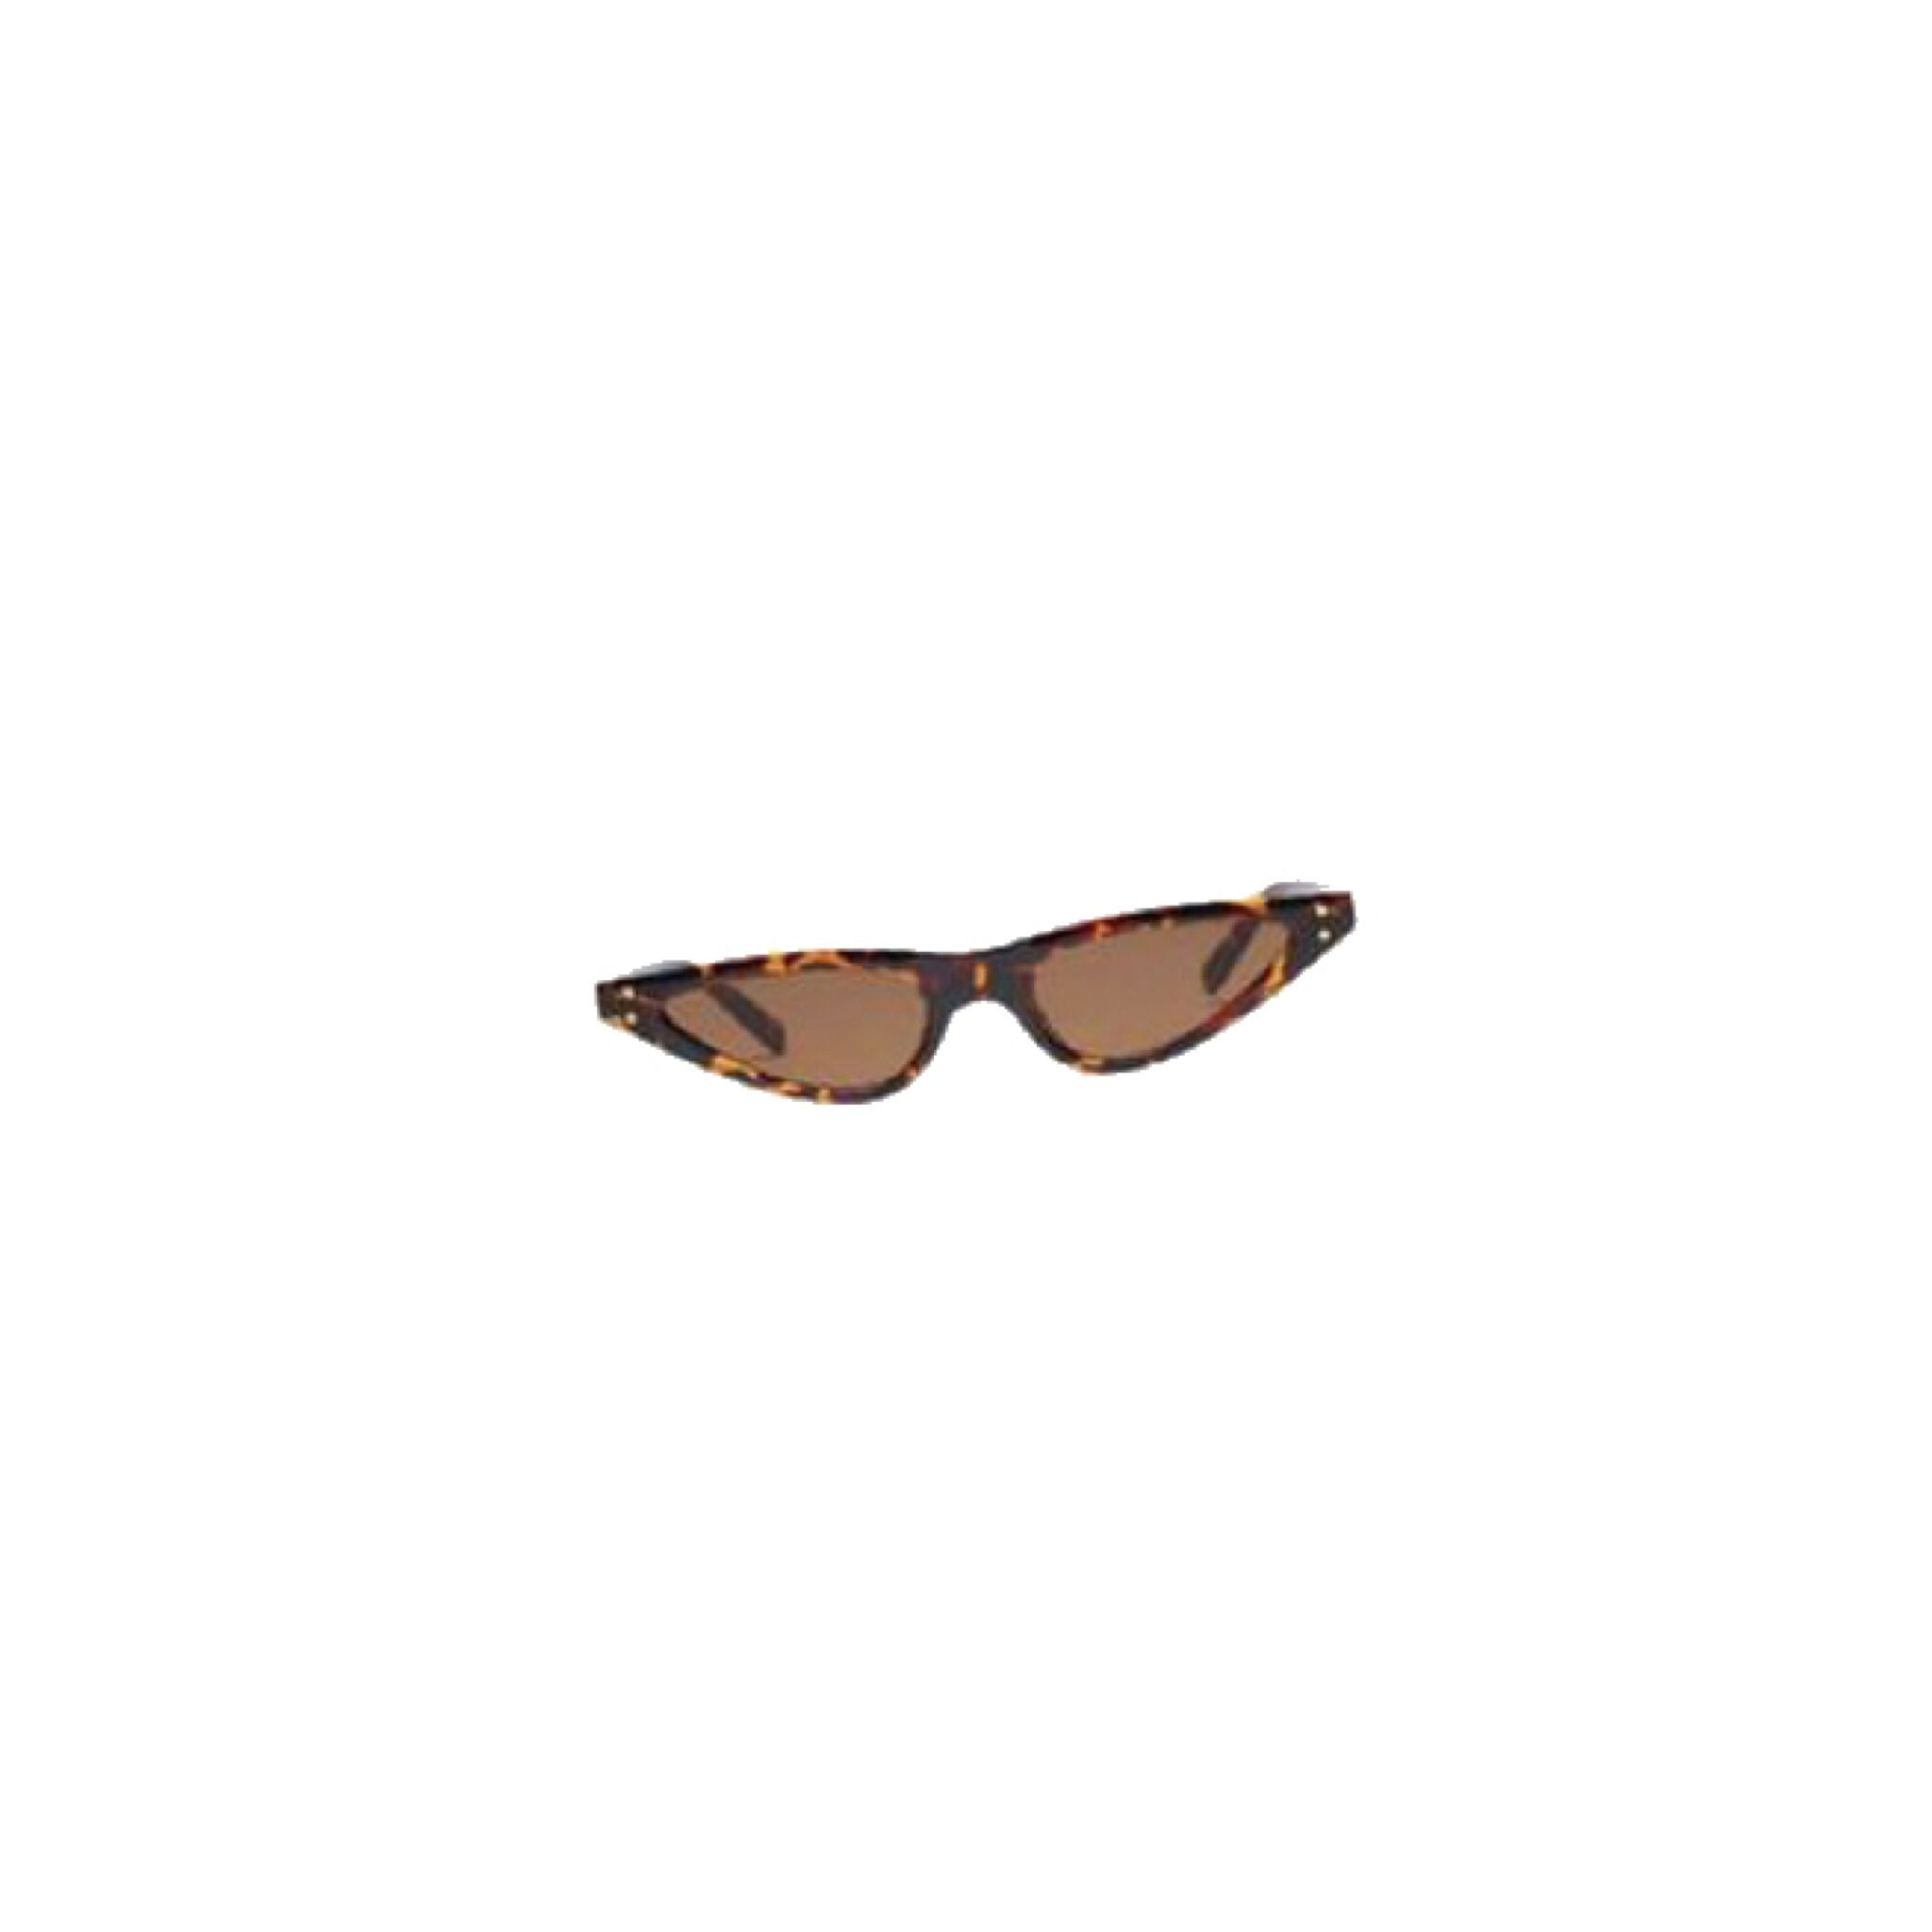 Sunglasses Png Glasses Cat Eye Glasses Cat Eye Sunglasses